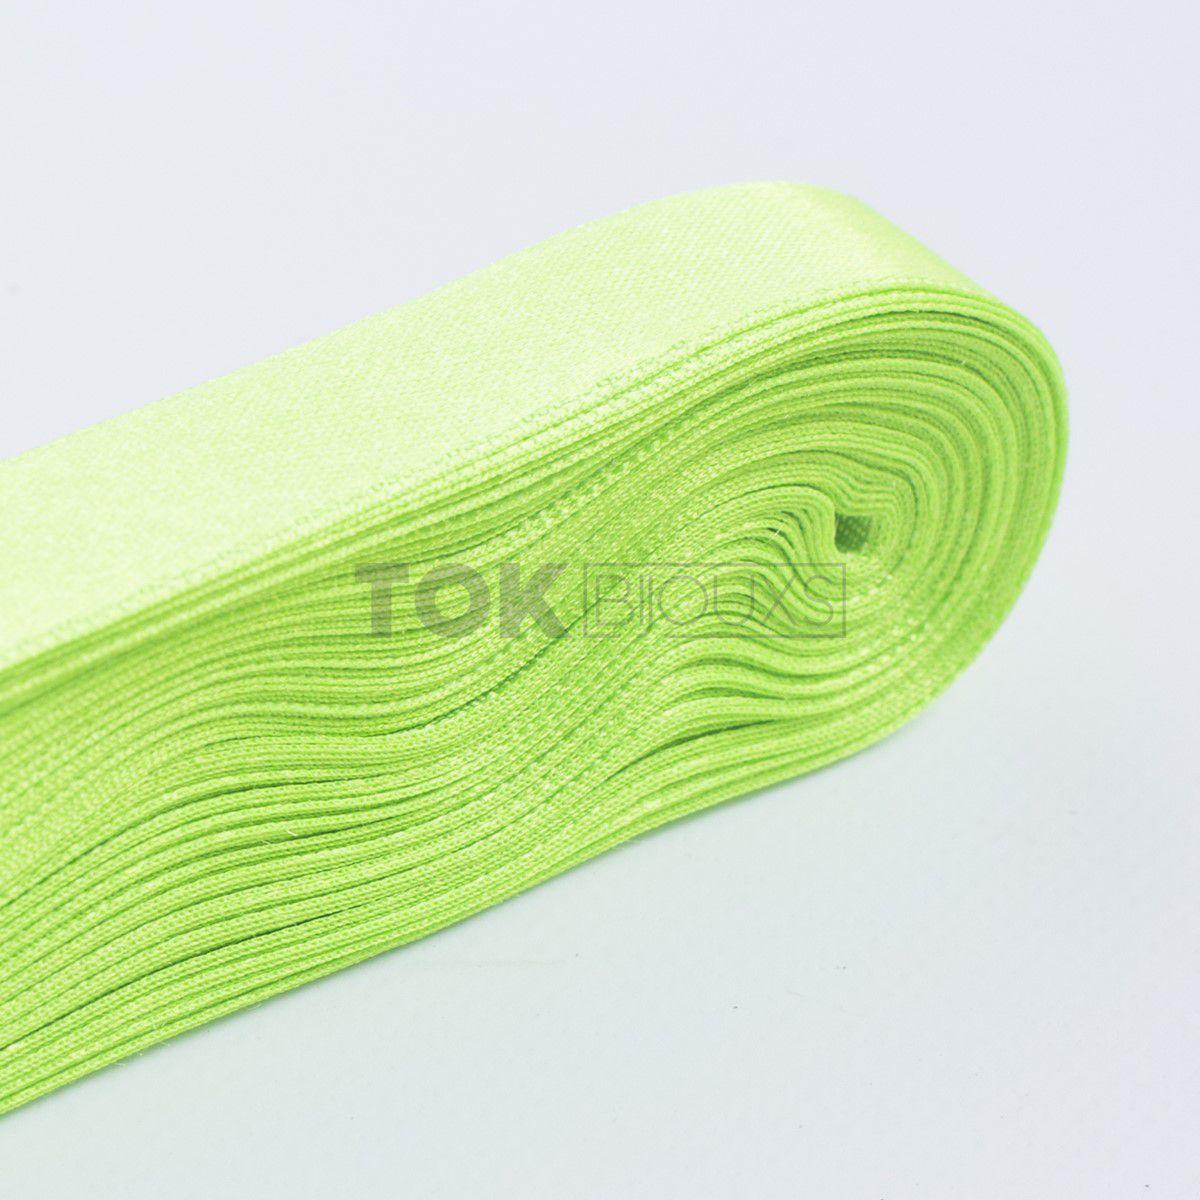 Fita Cetim N.5 - 22mm - 10 Metros - COR (59) Verde Limão